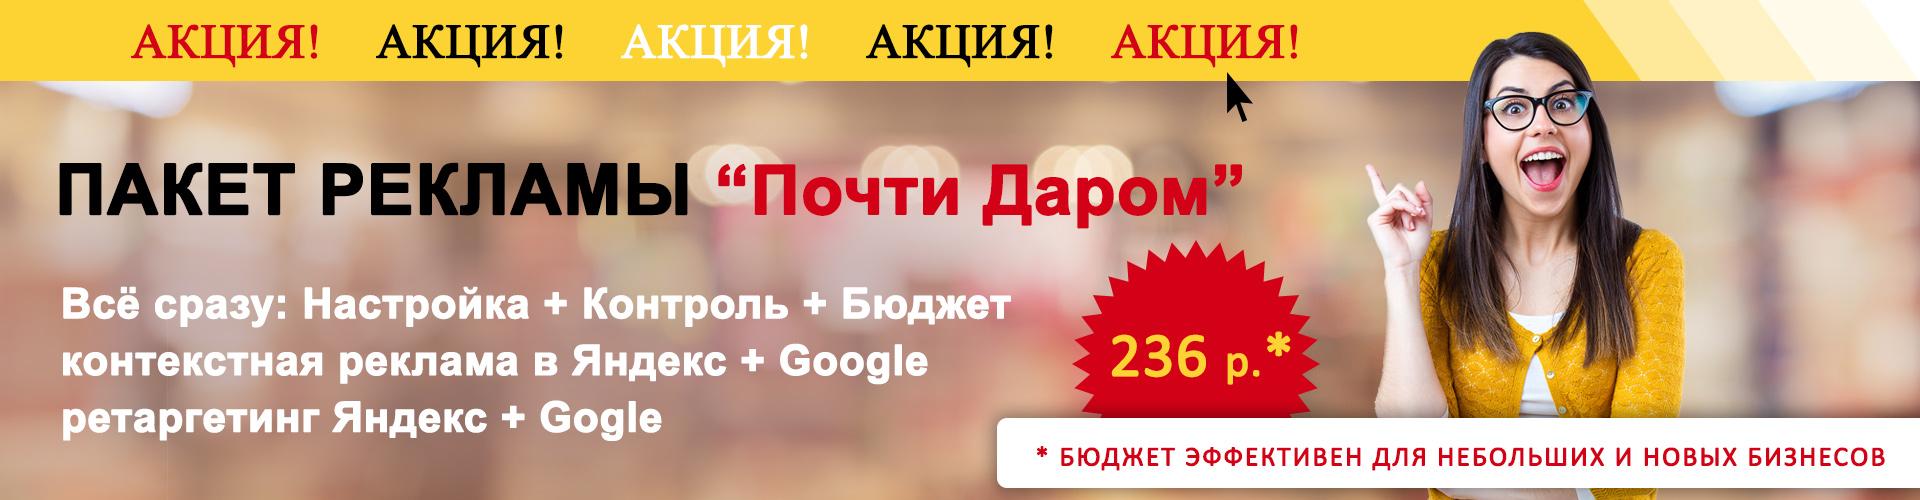 реклама и банеры Яндекс и Гугл